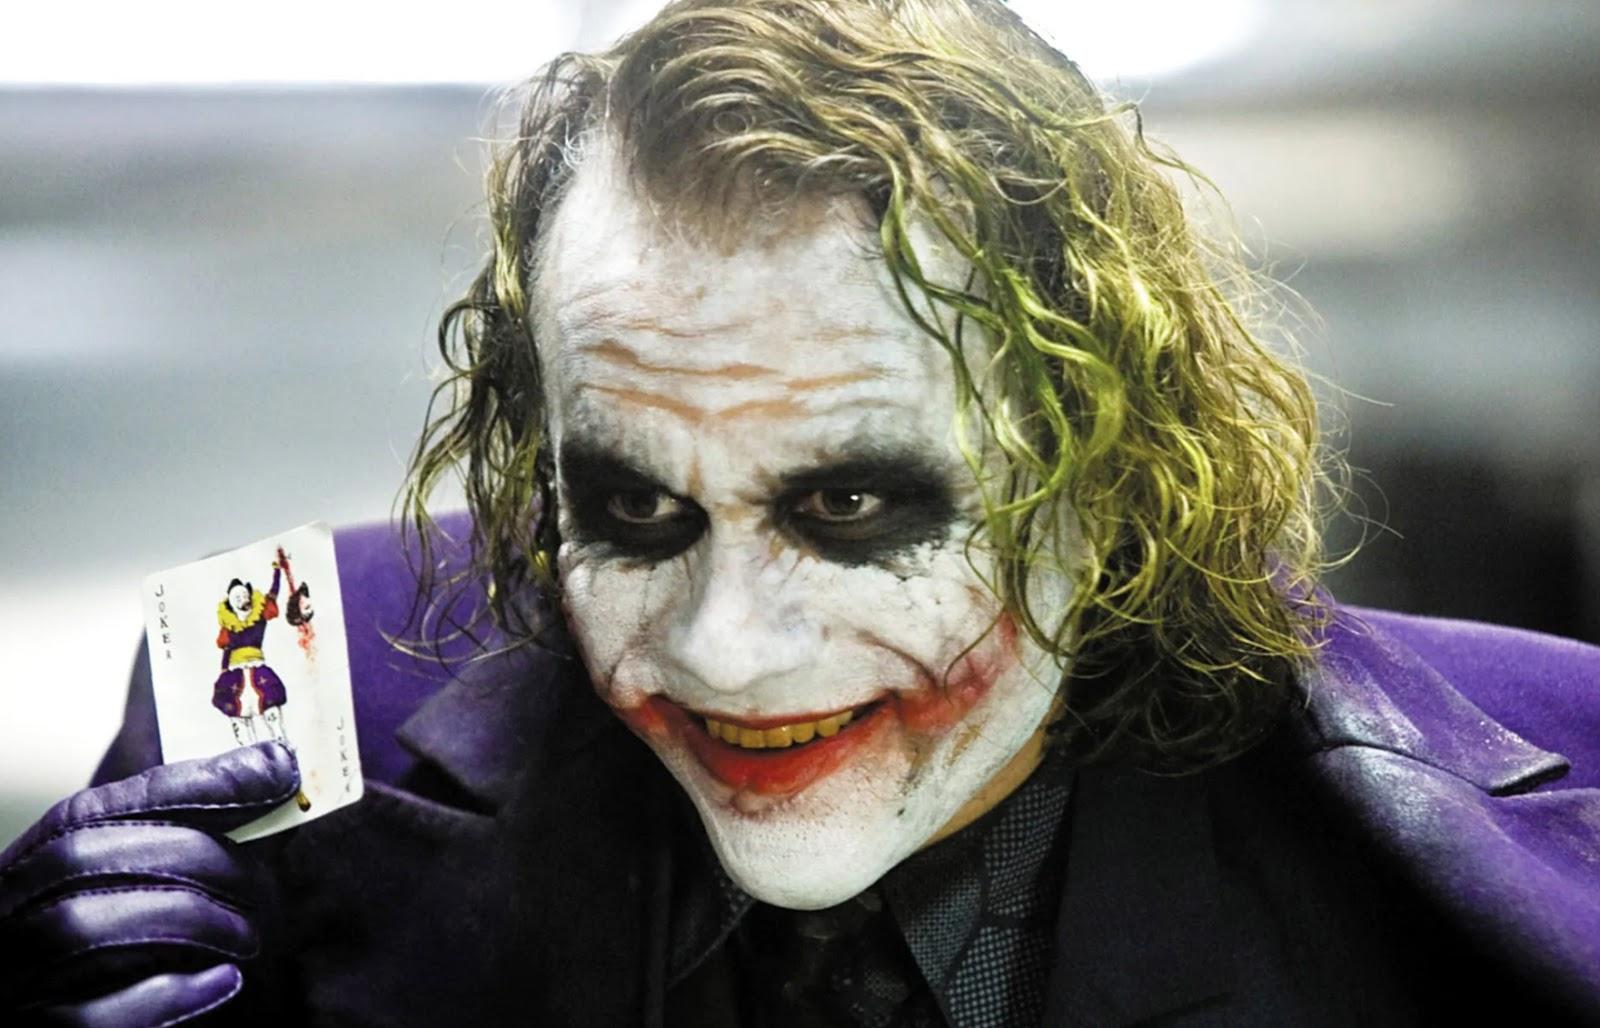 The Joker, Joaquin Pheonix